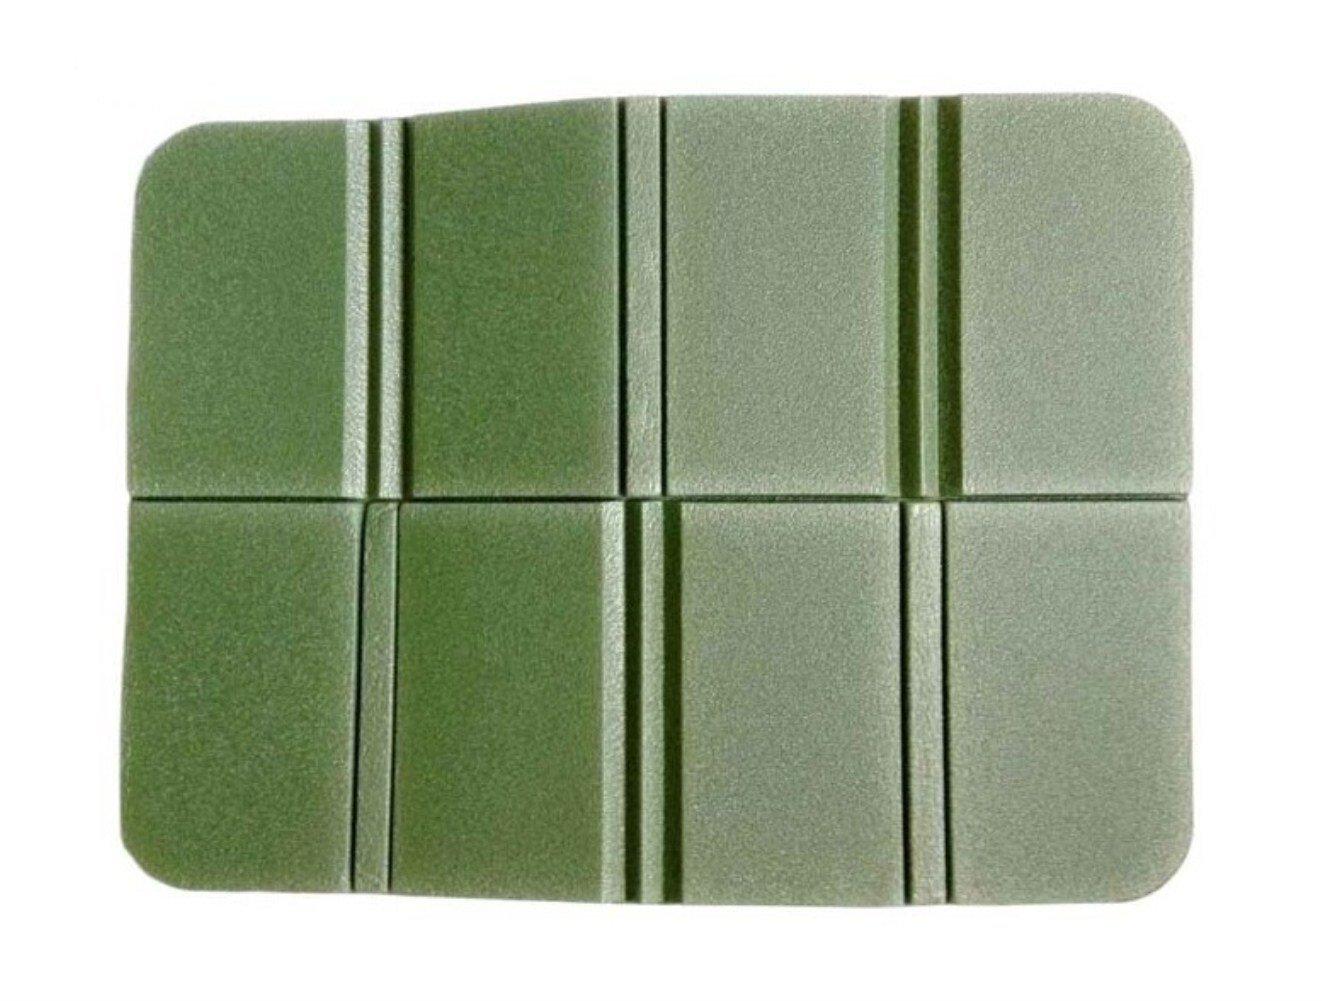 snlmy折りたたみ式折り畳みアウトドアキャンプマットシートFoam XPEクッションポータブル防水椅子ピクニックマットパッド B078S9J45Y  グリーン